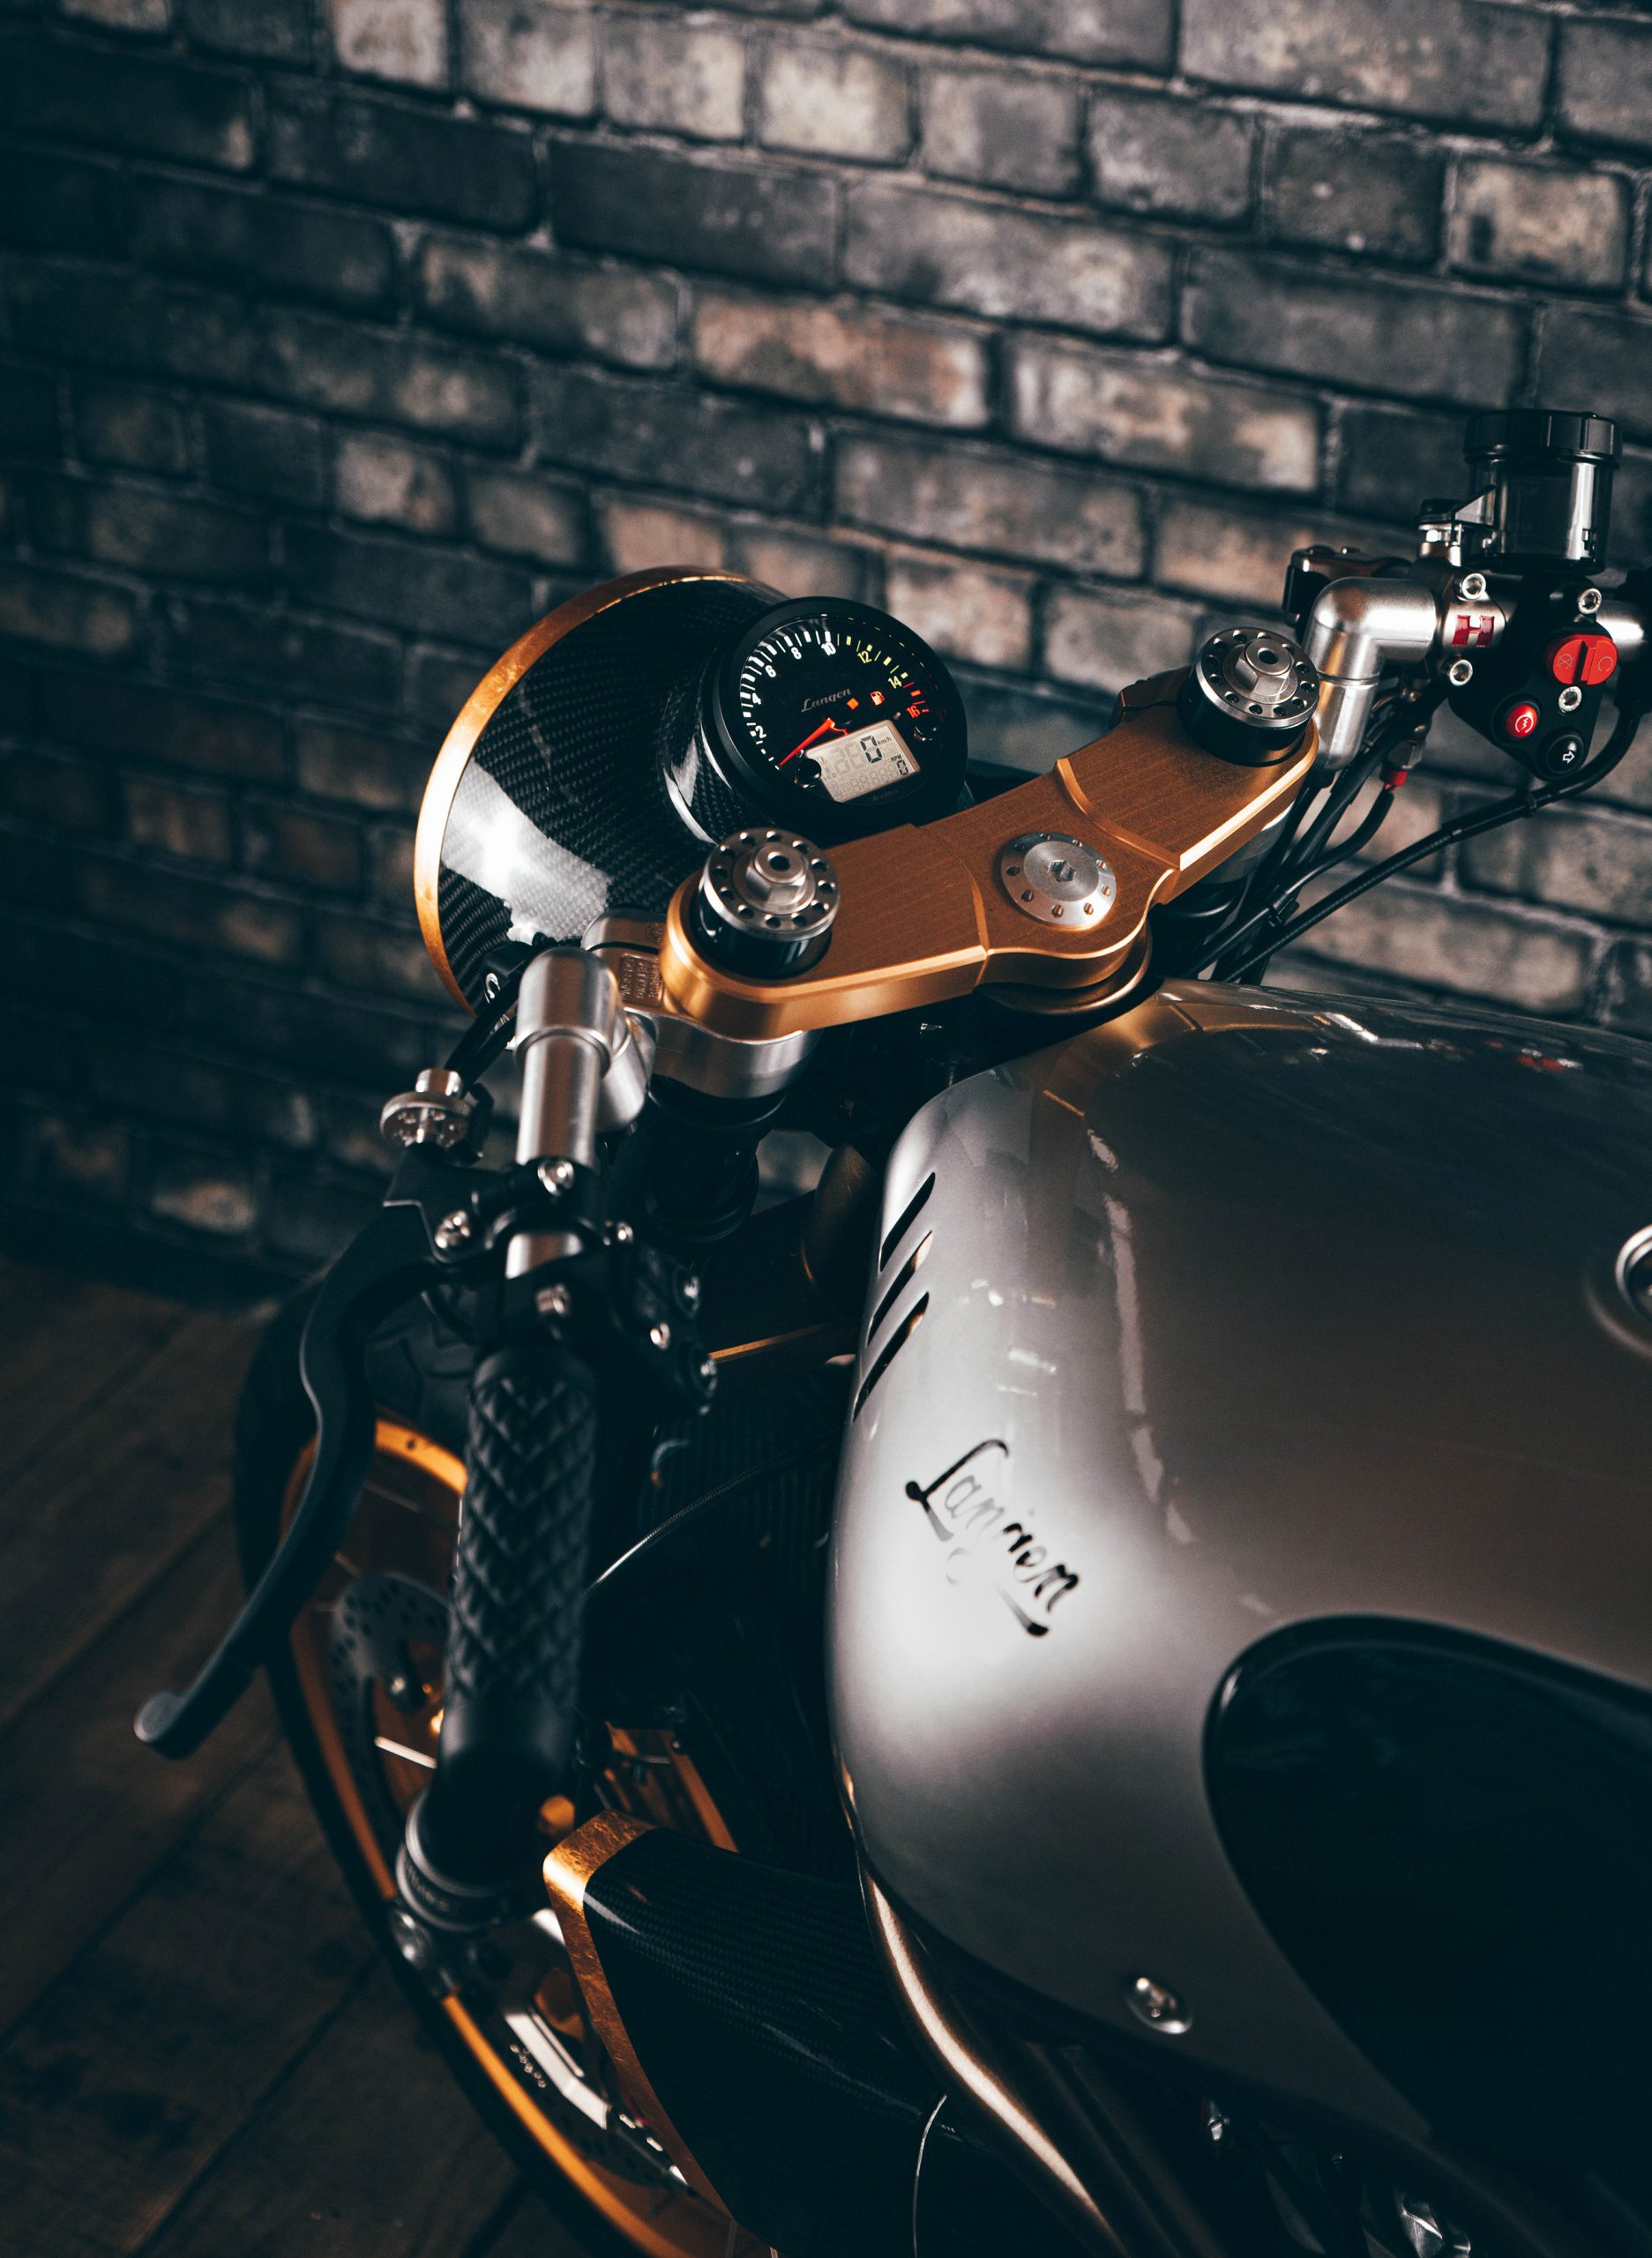 Langen Motorcycles Two Stroke front handling